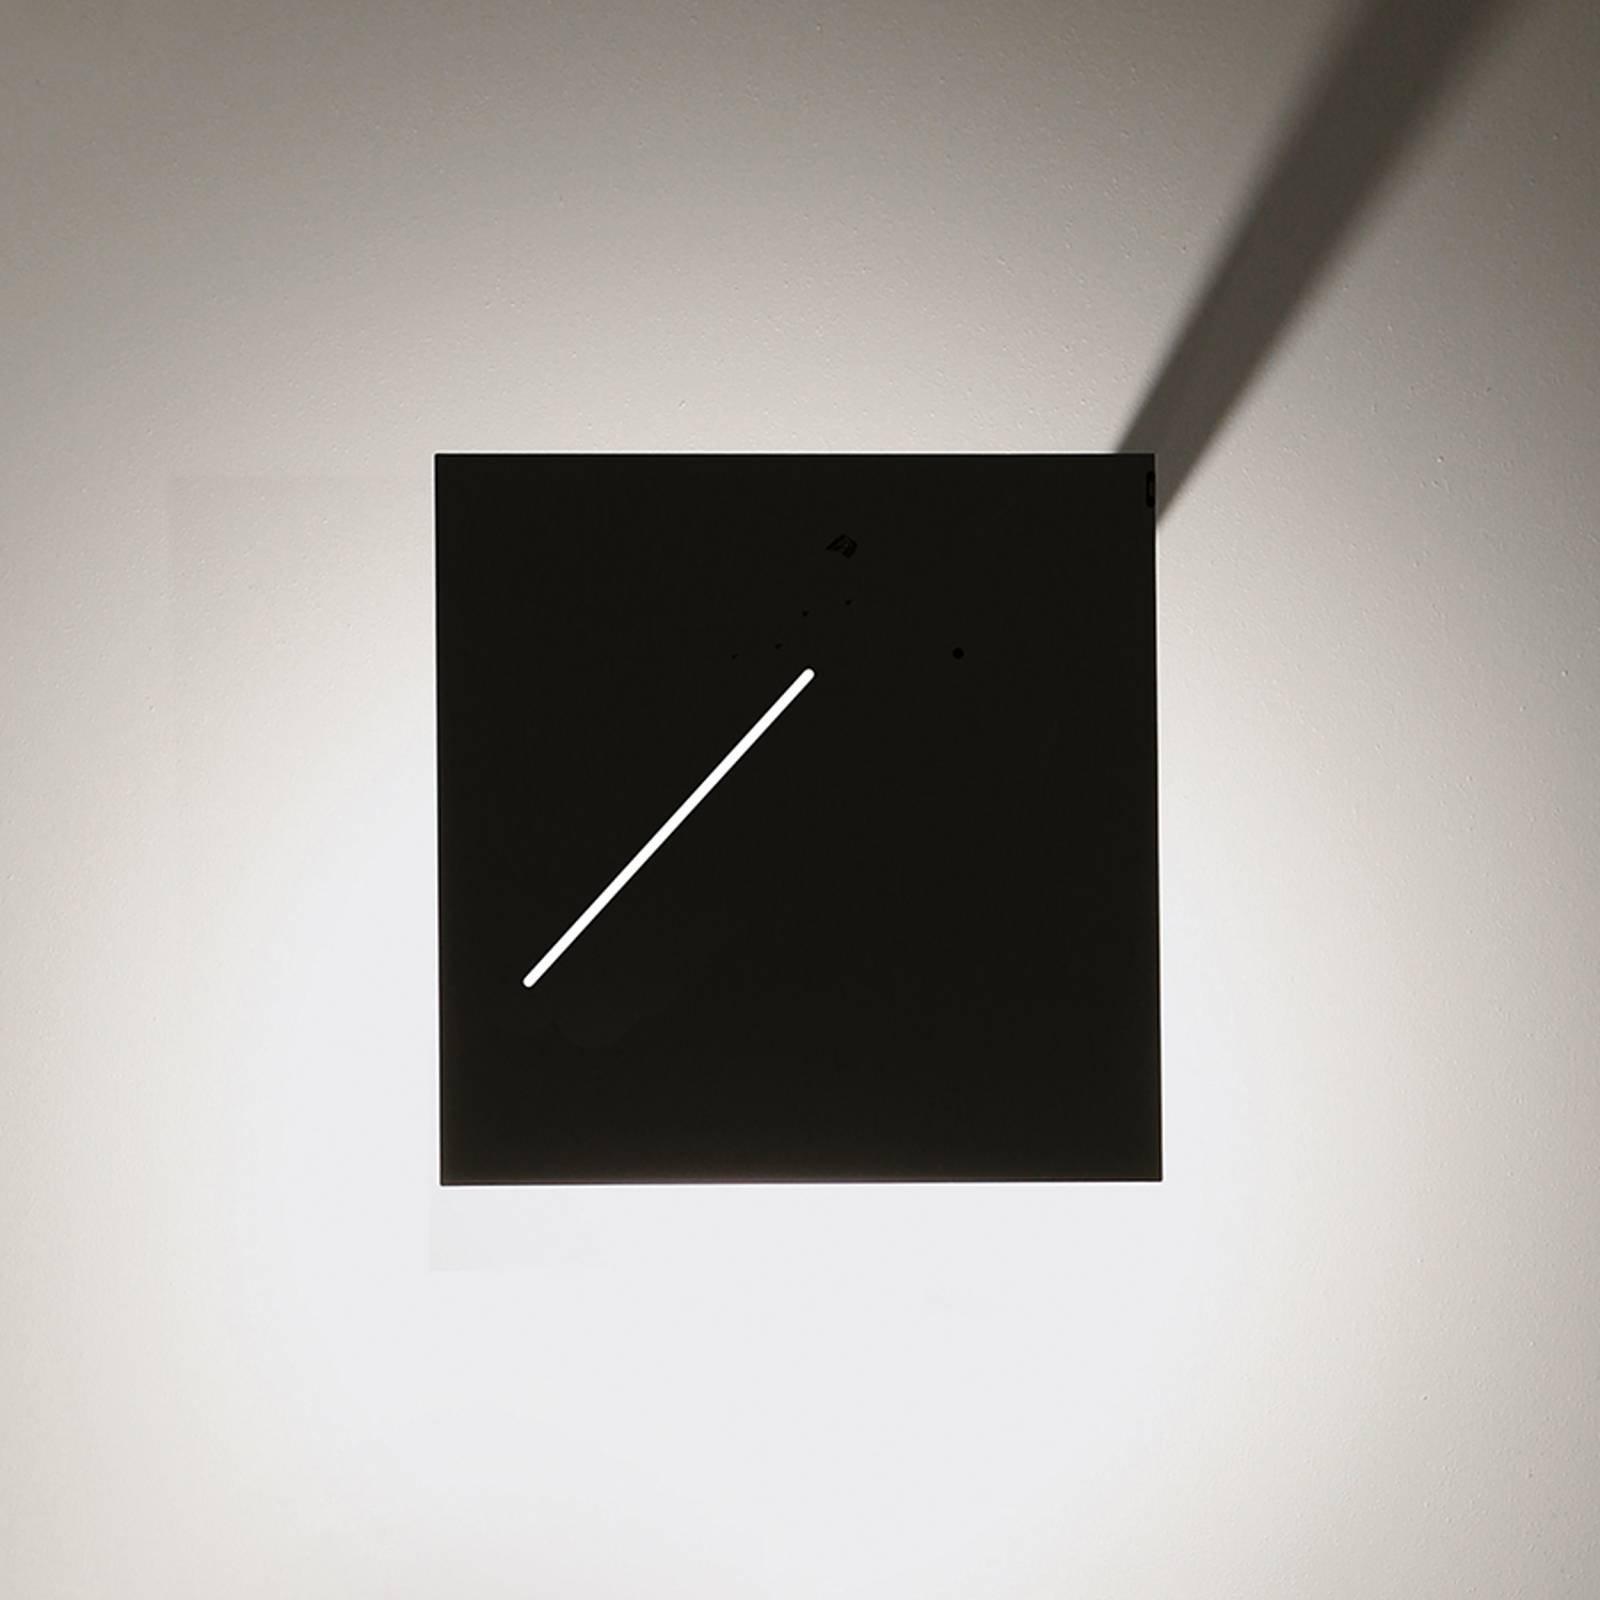 Knikerboker Des.agn - LED-vegglampe, svart